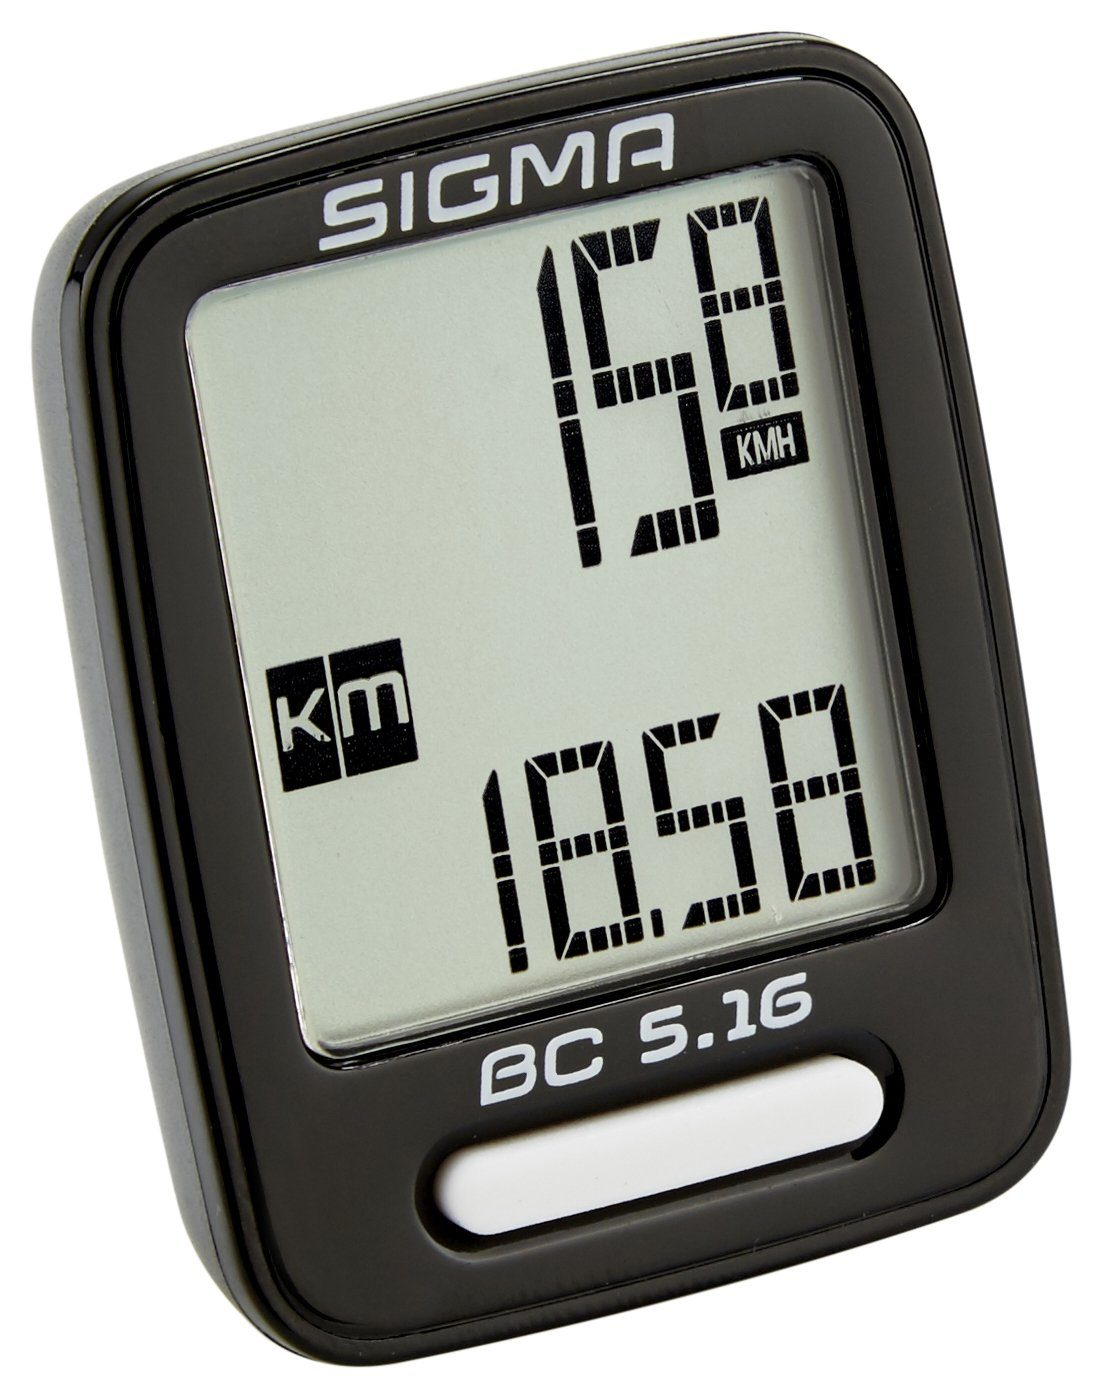 Sigma Sport Fahrradcomputer »BC 5.16 Fahrradcomputer«